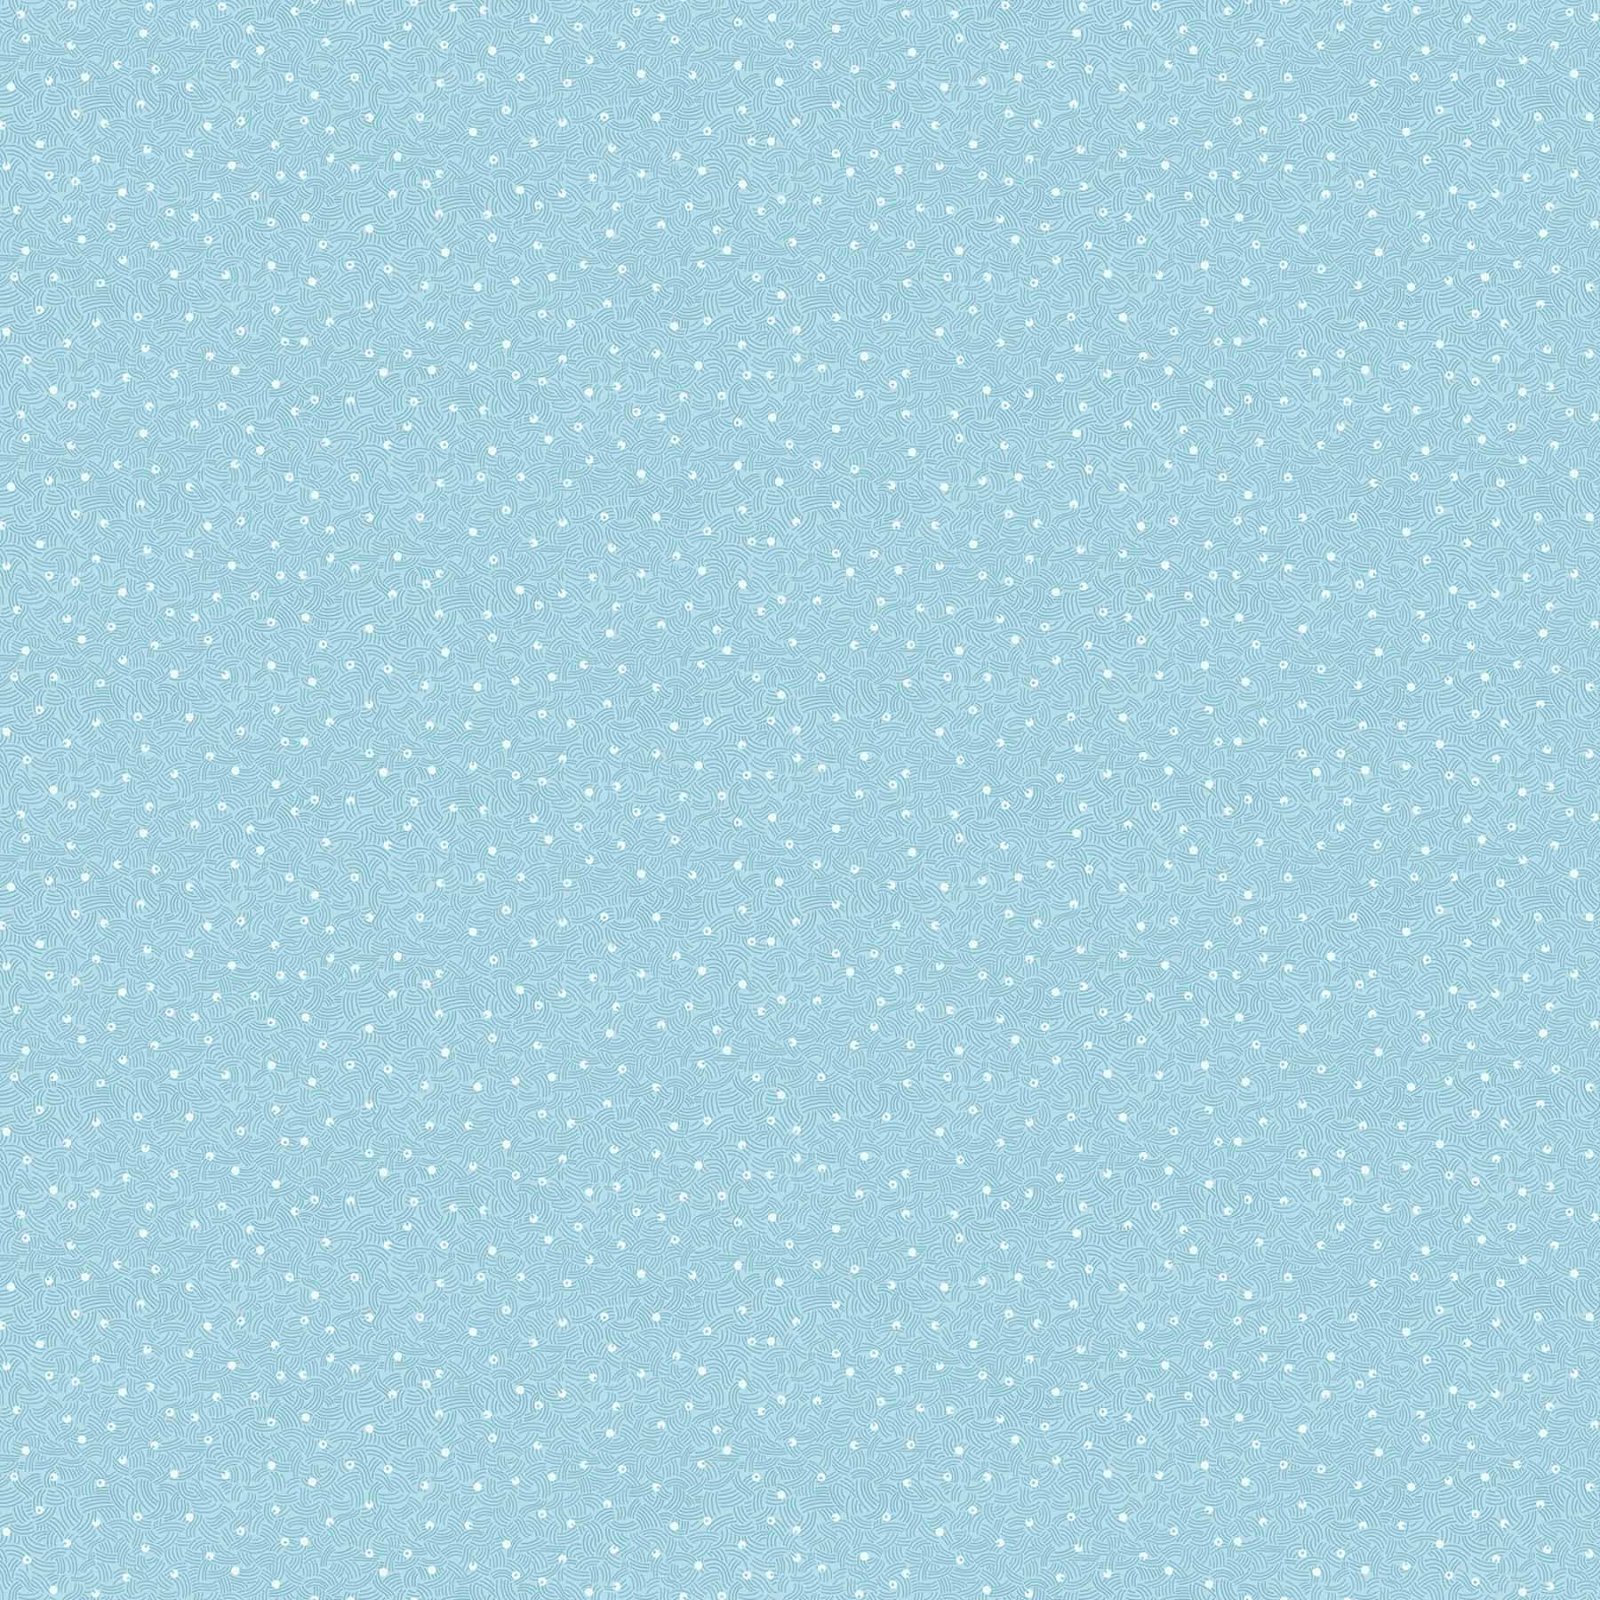 Elements by Ghazal Razavi - Air - Blue